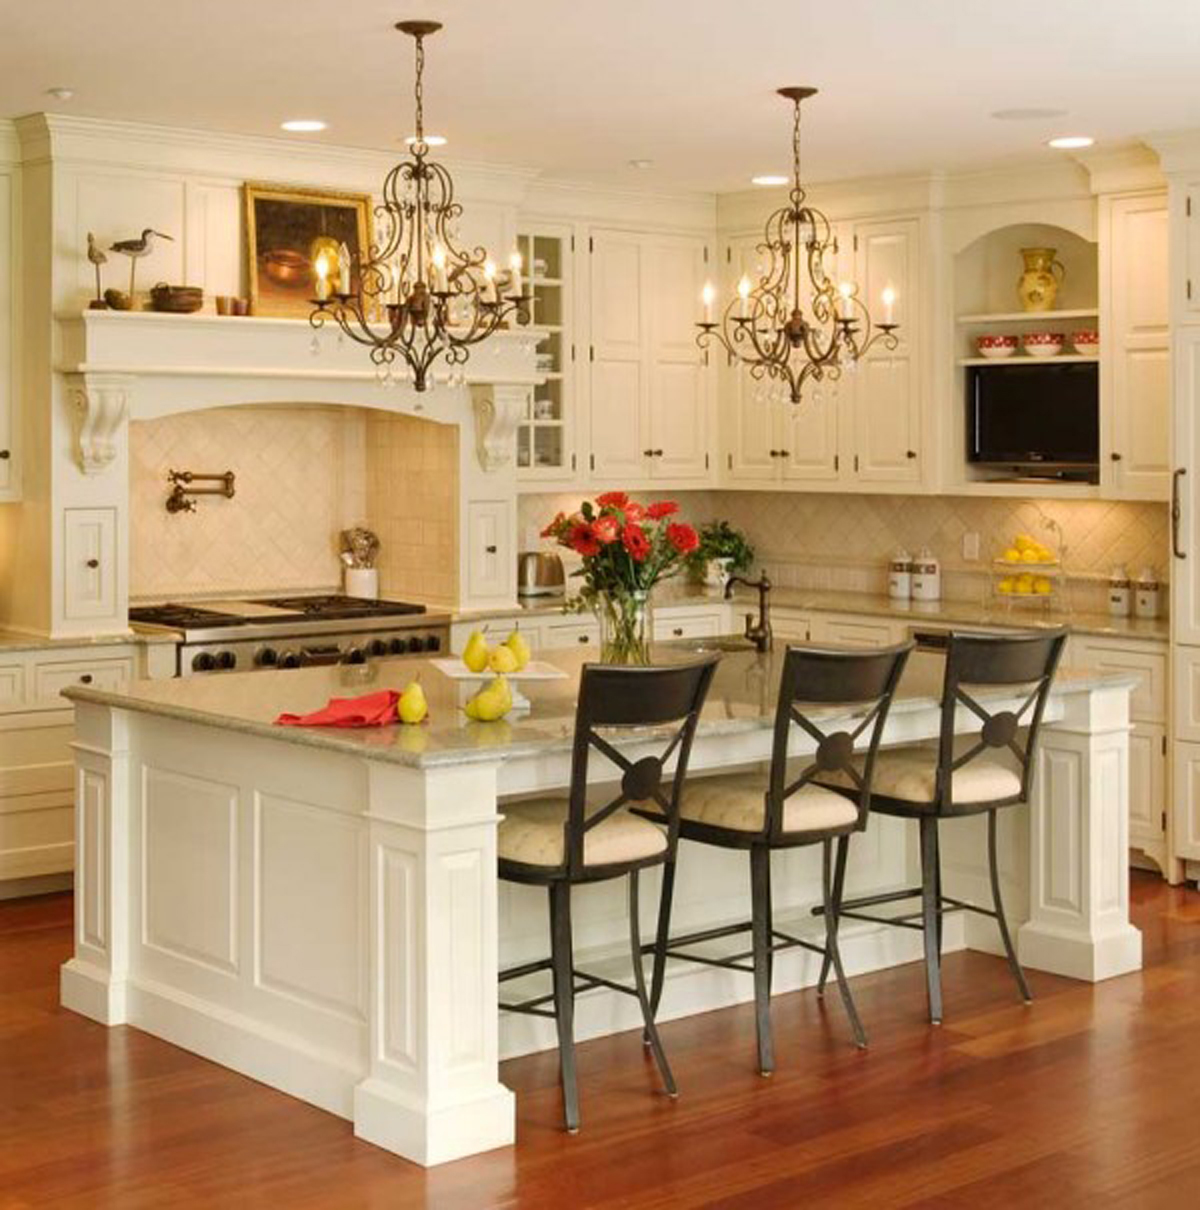 cuisine-classique-avec-ilot-blanc-design-interieur-retro